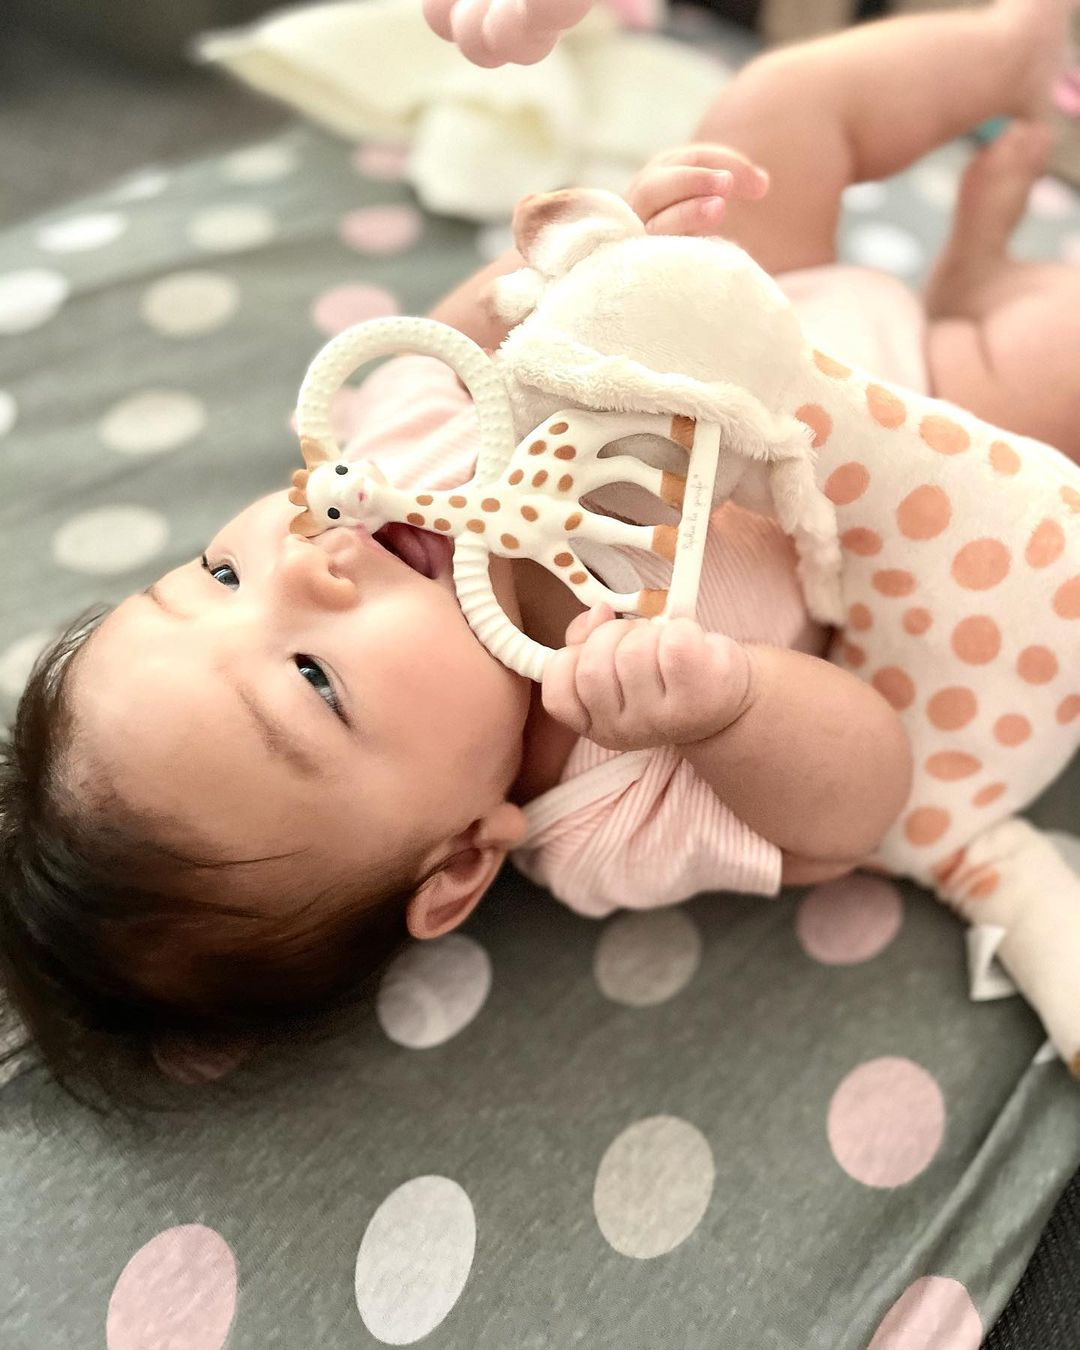 Baby using with Sophie La Giraffe teethers